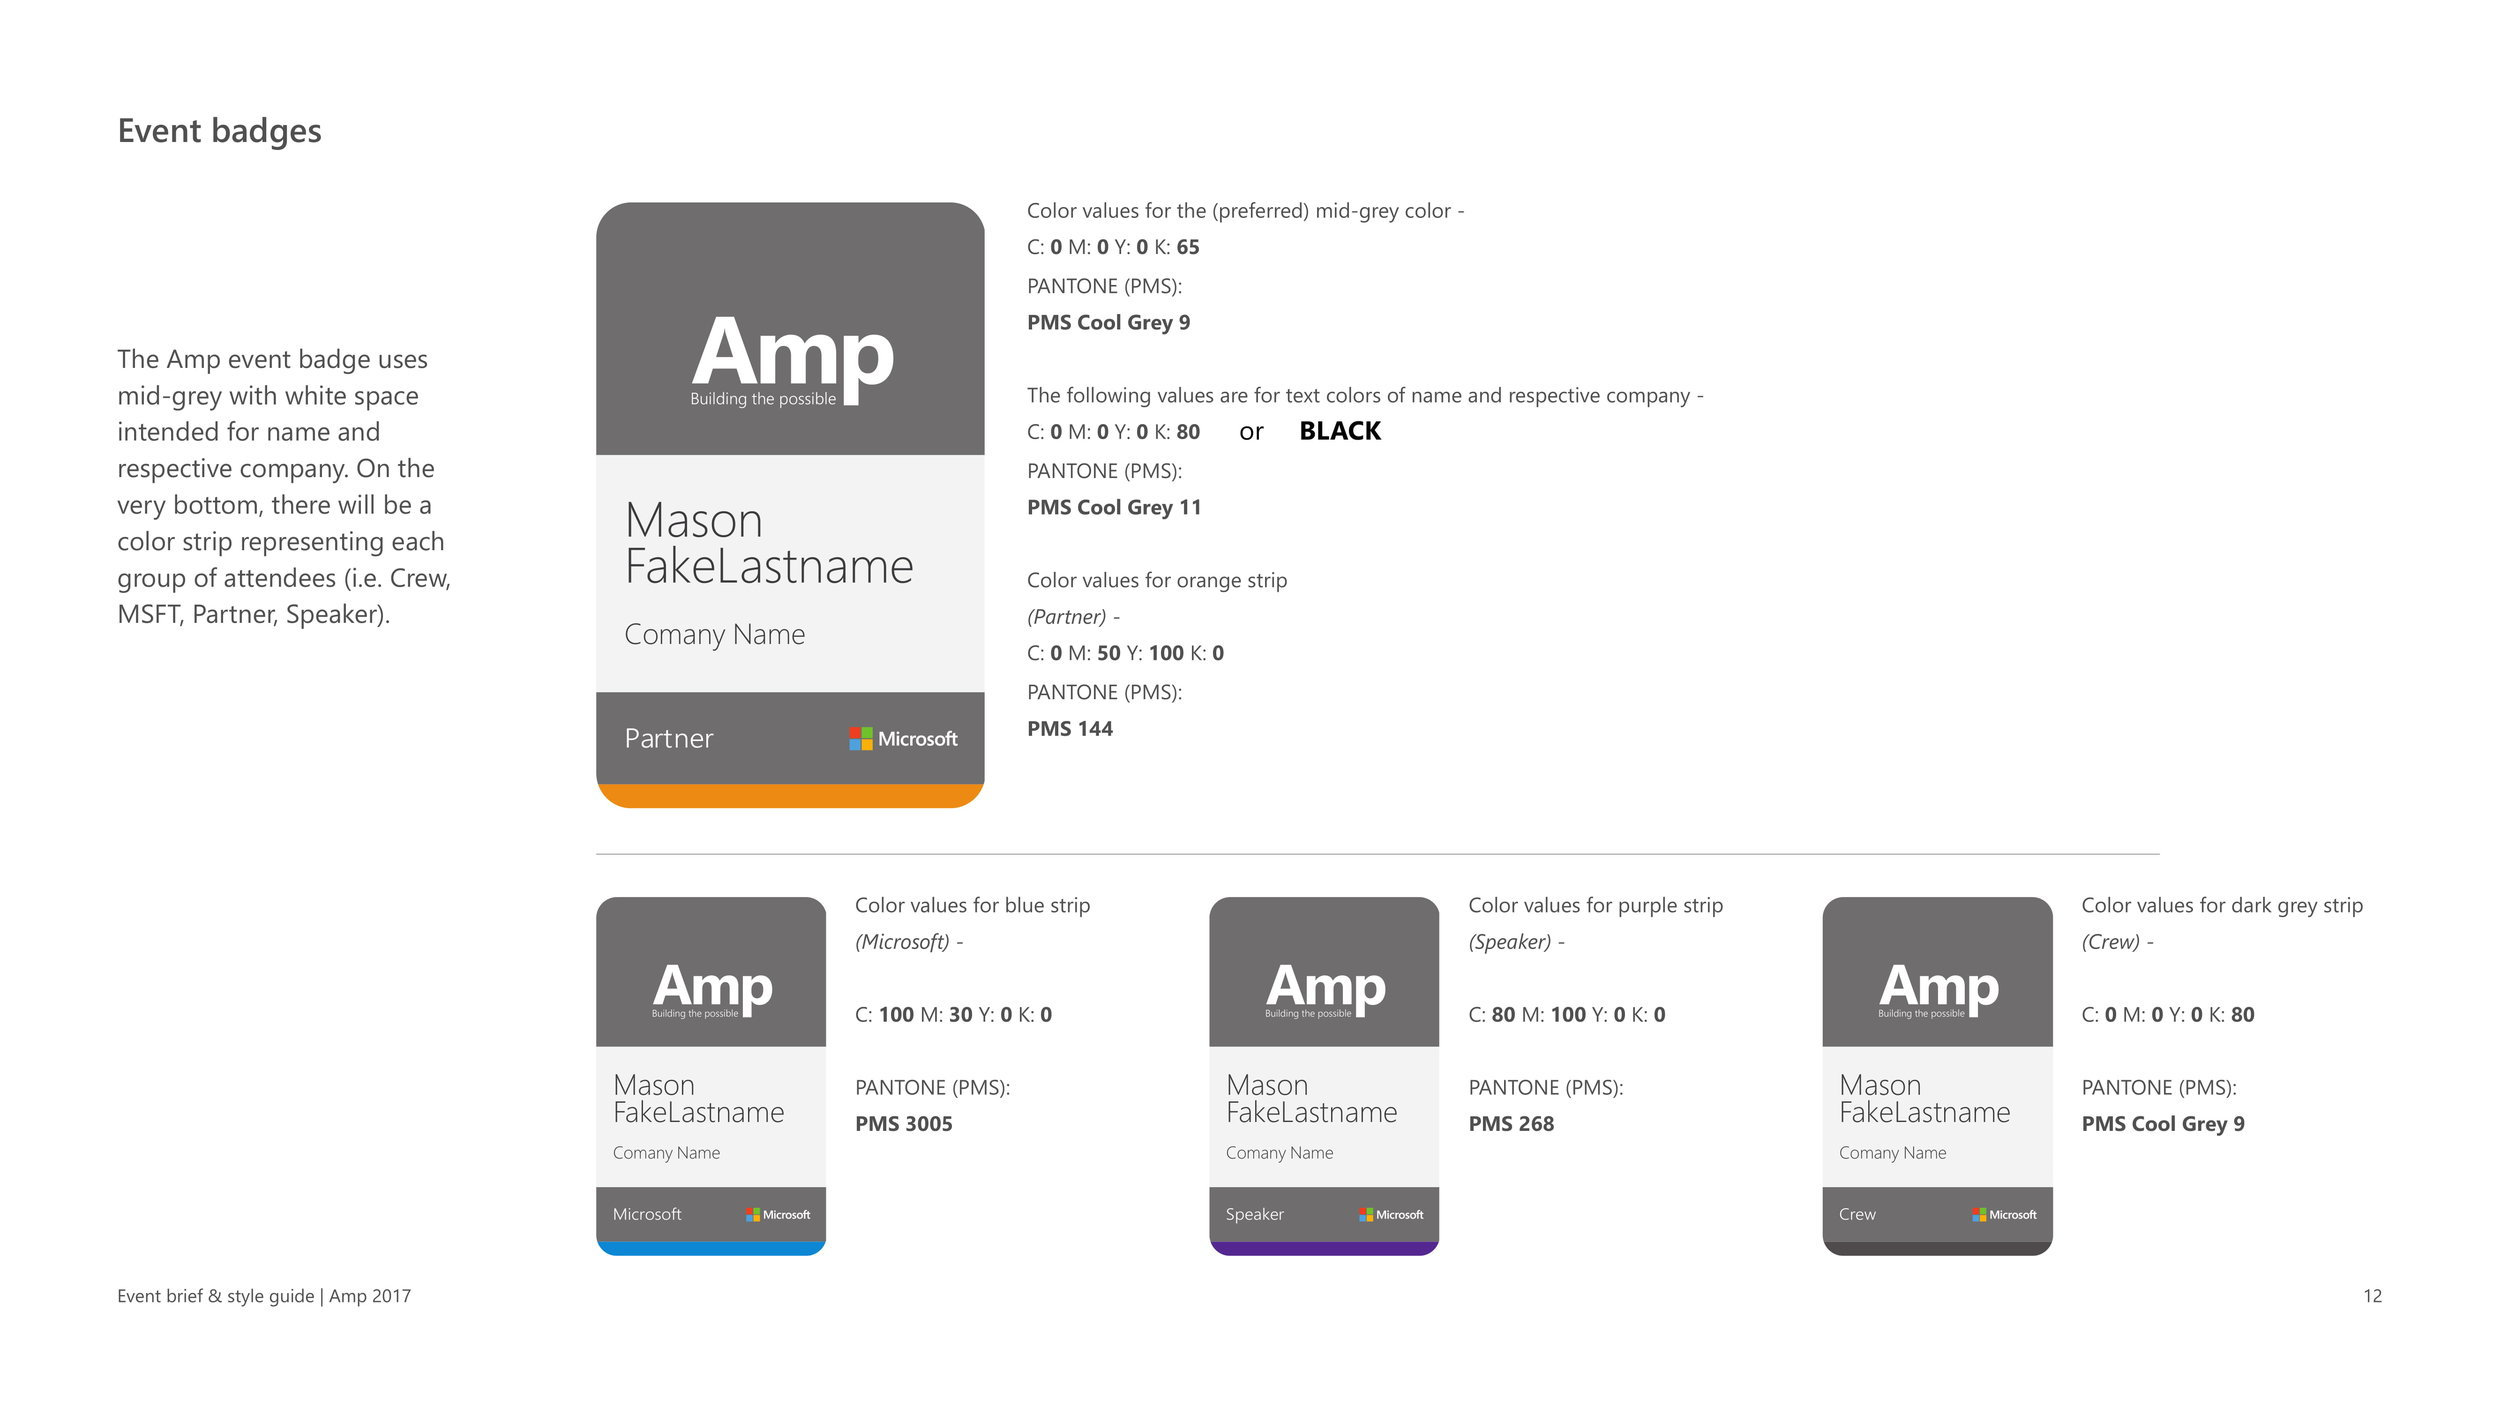 AMP_2017_Style_Guide_190629_1030-12.jpg